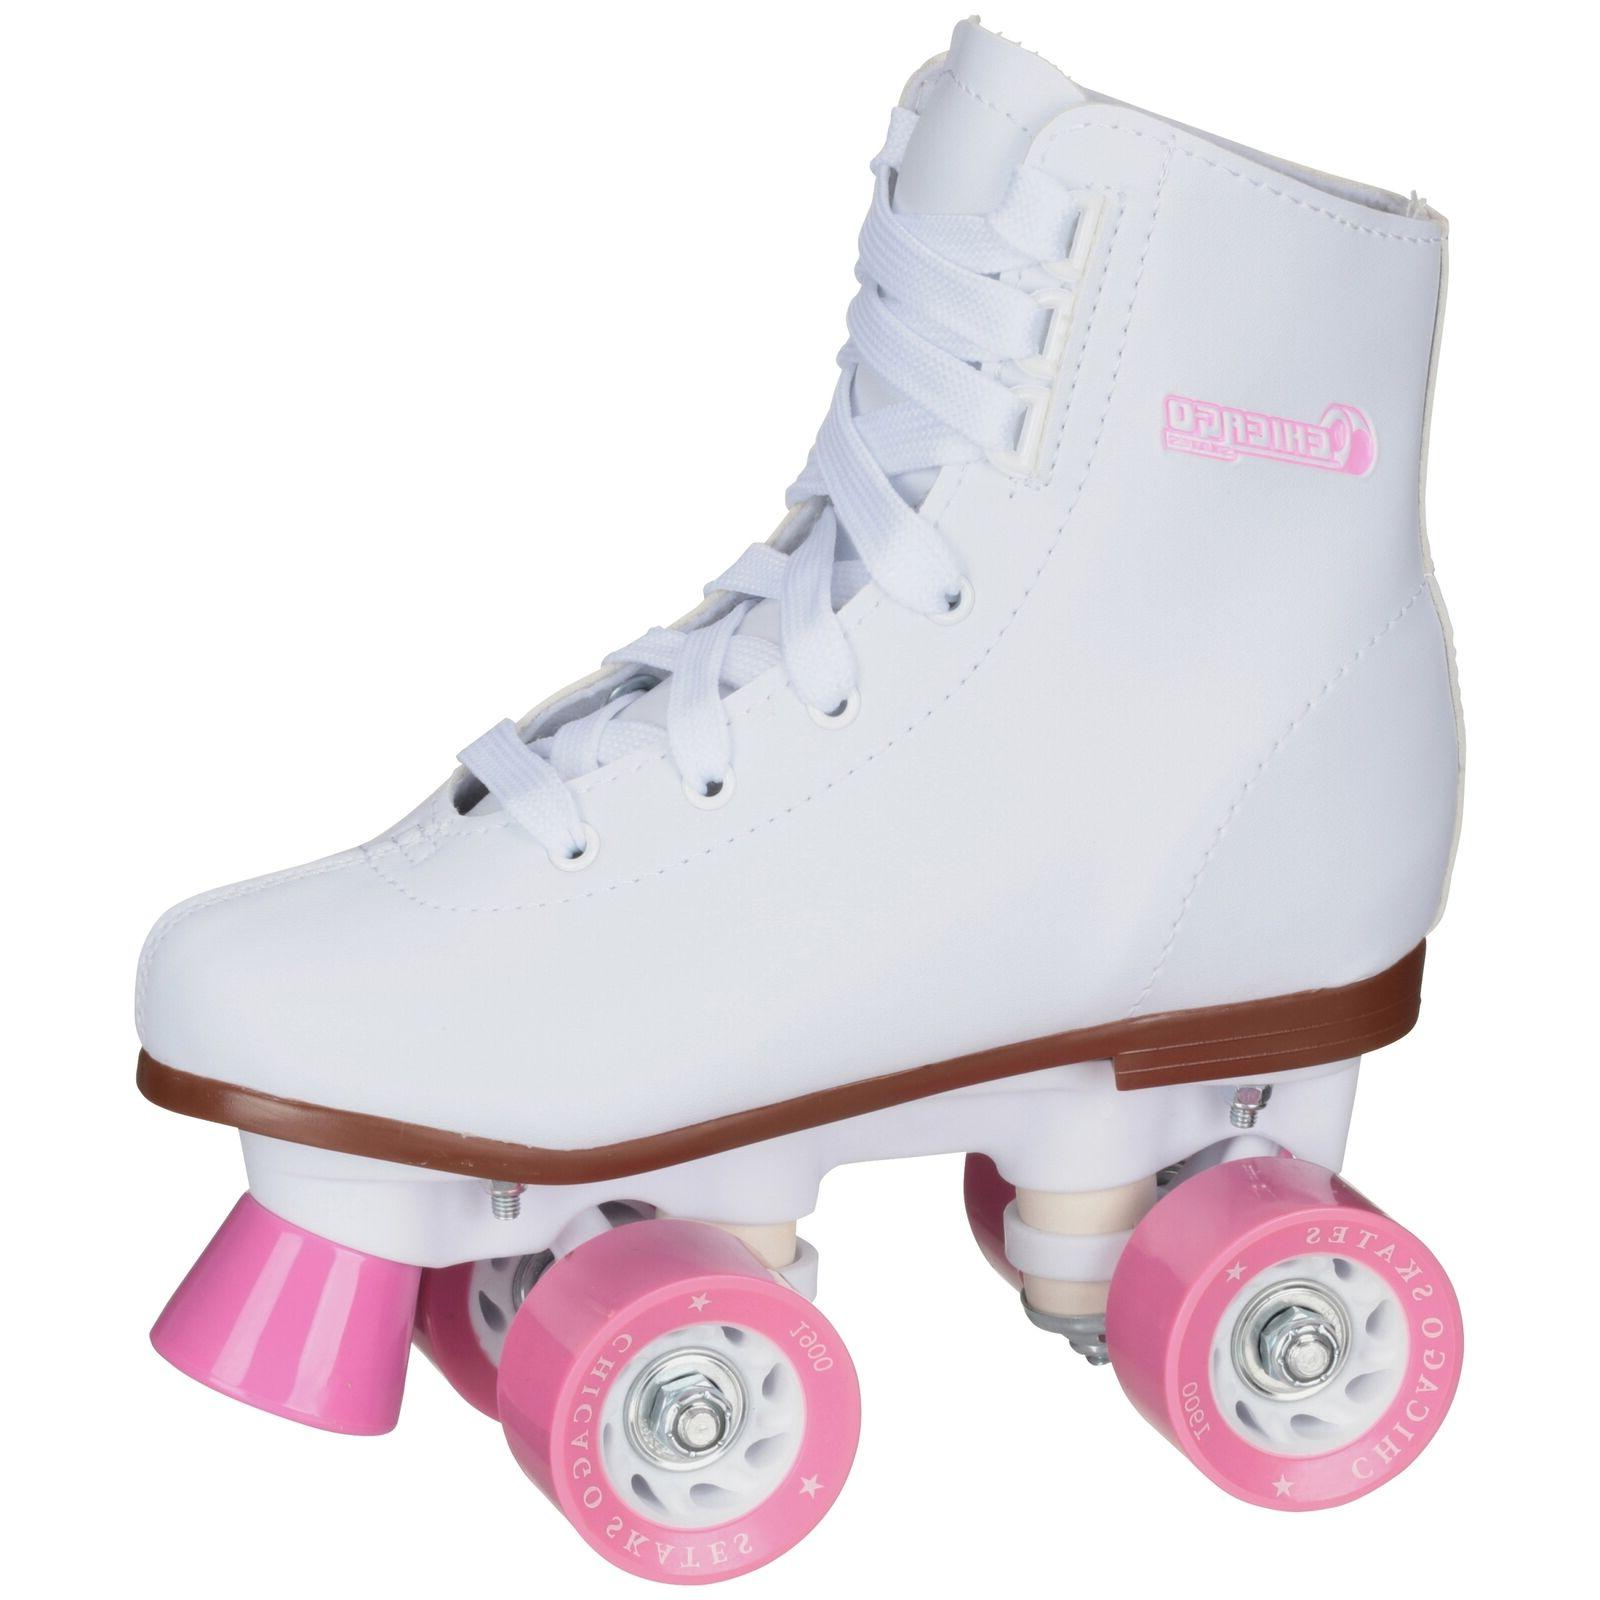 Chicago Girls' Classic Quad Roller Skates White Junior Rink